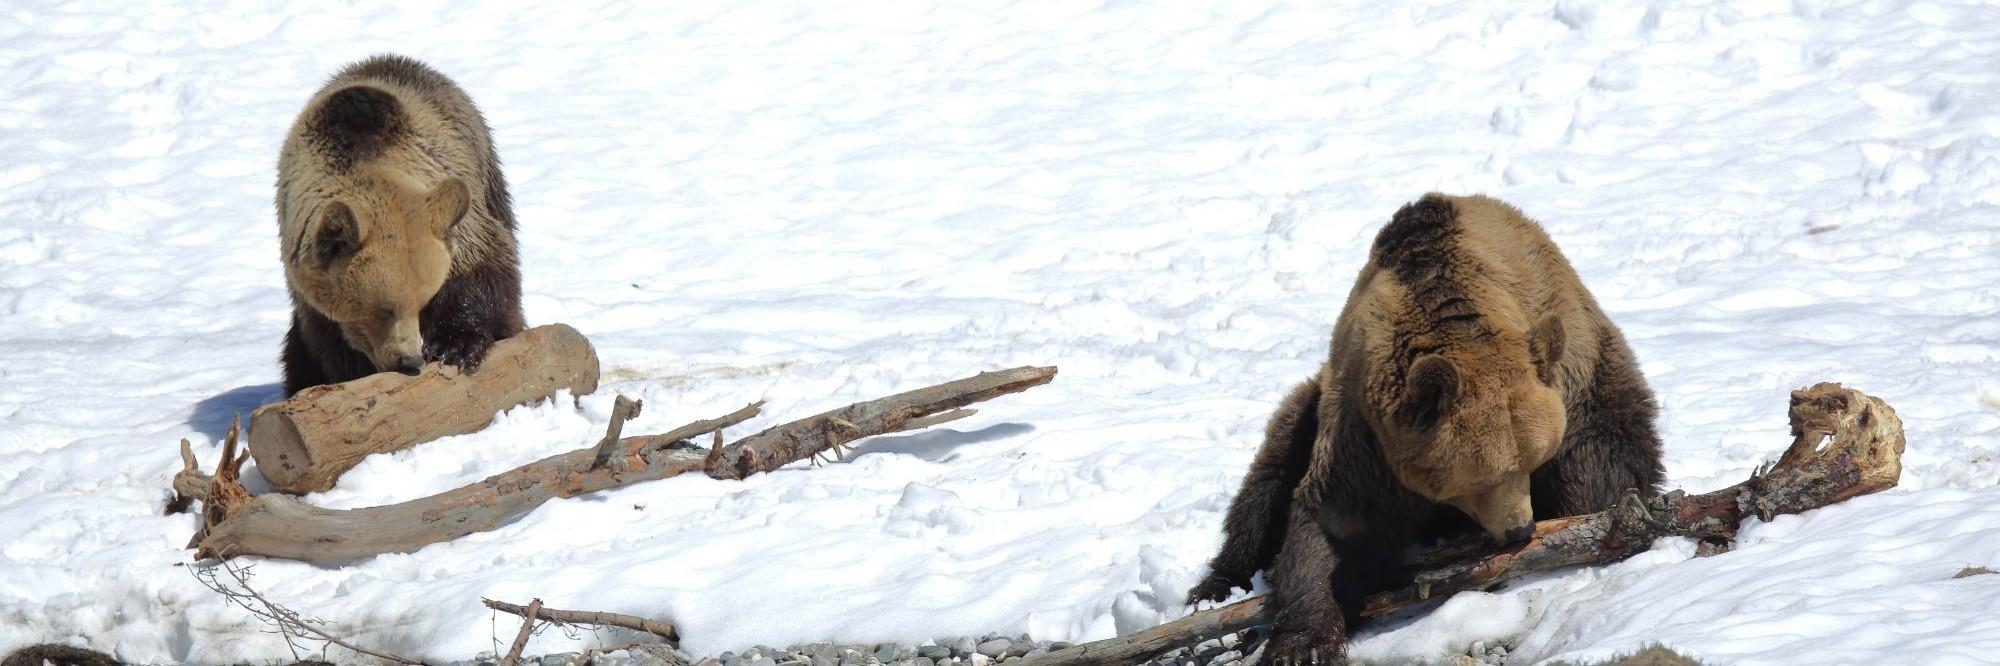 Bears in Arosa